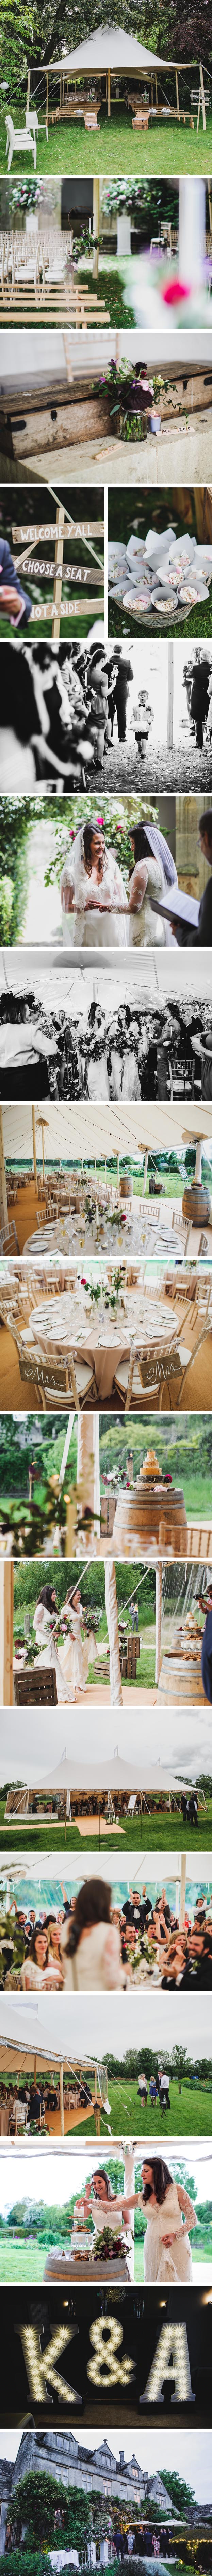 Amy & Kim PapaKata Sperry Wedding at Barnsley House, Gloucestershire